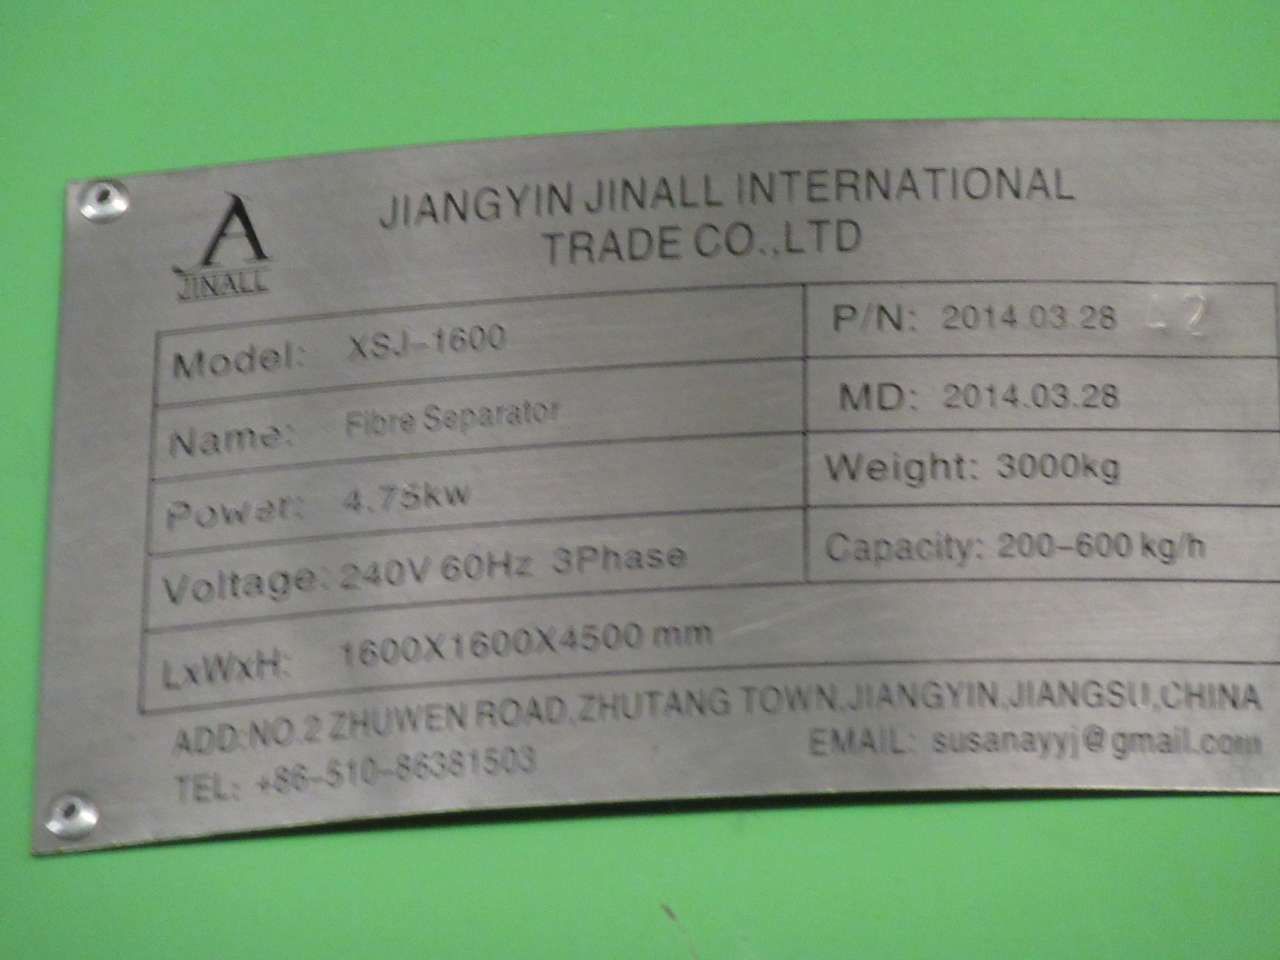 Lot 13 - 2014 Jiangyin Jinall International Trade Co. XSJ-1600 Fibre Seperator